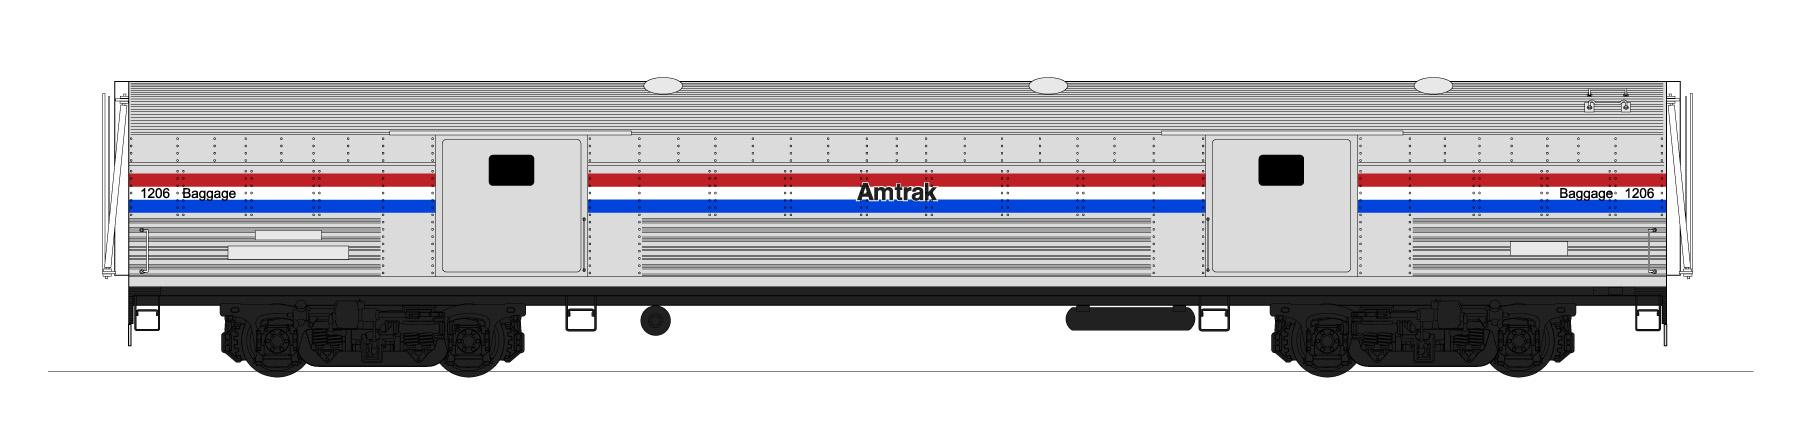 1800x434 Amtrak Train Clipart